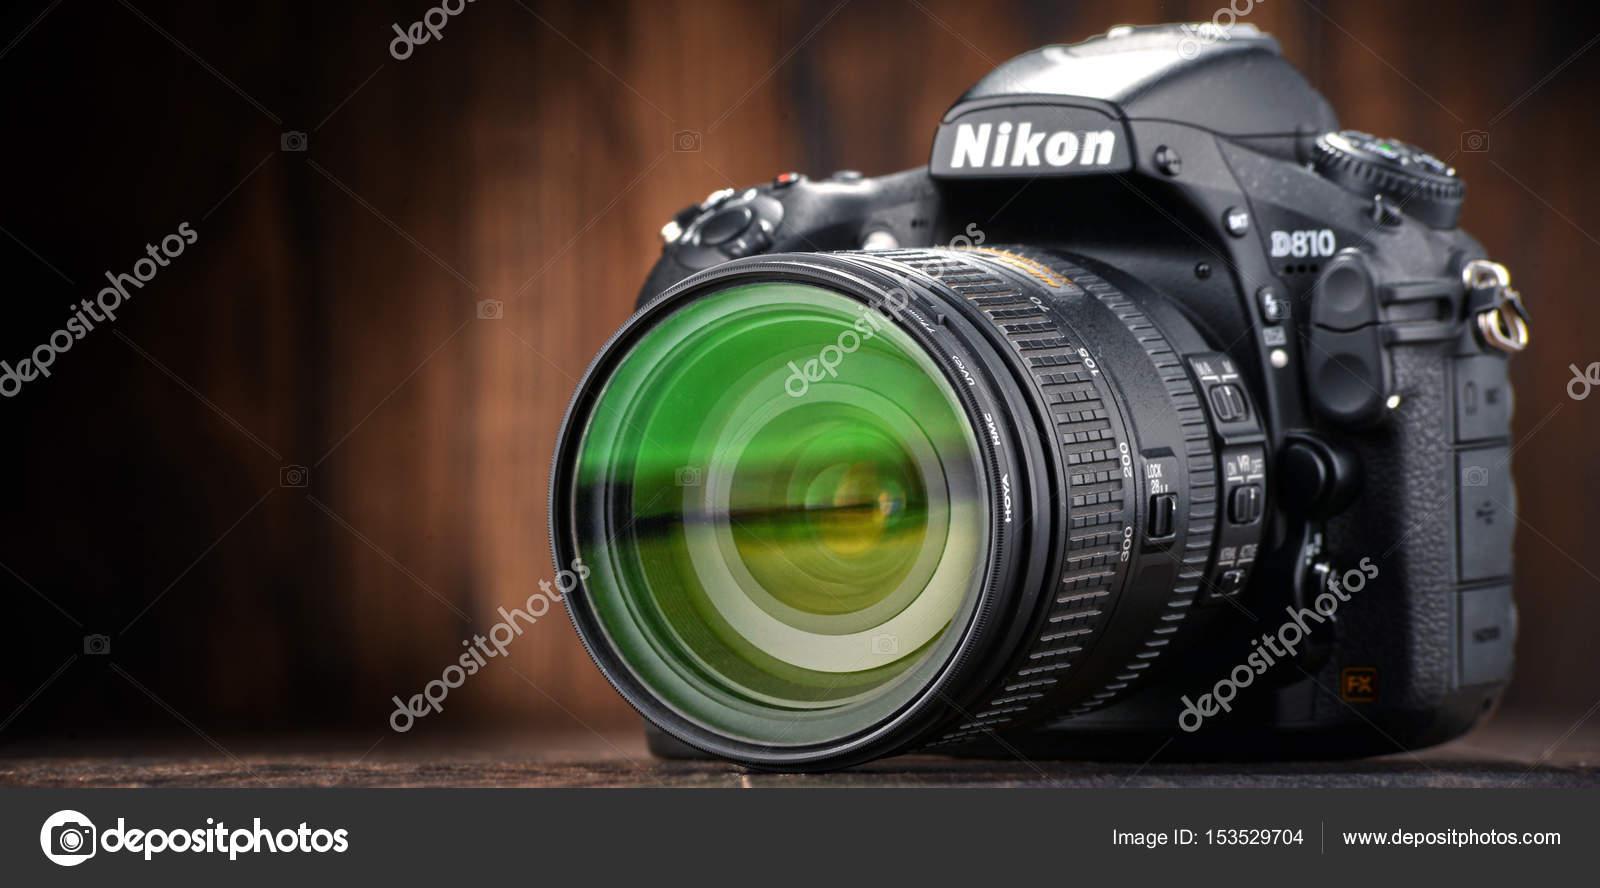 Nikon D810 Kamera mit Nikkor-zoom — Redaktionelles Stockfoto ...